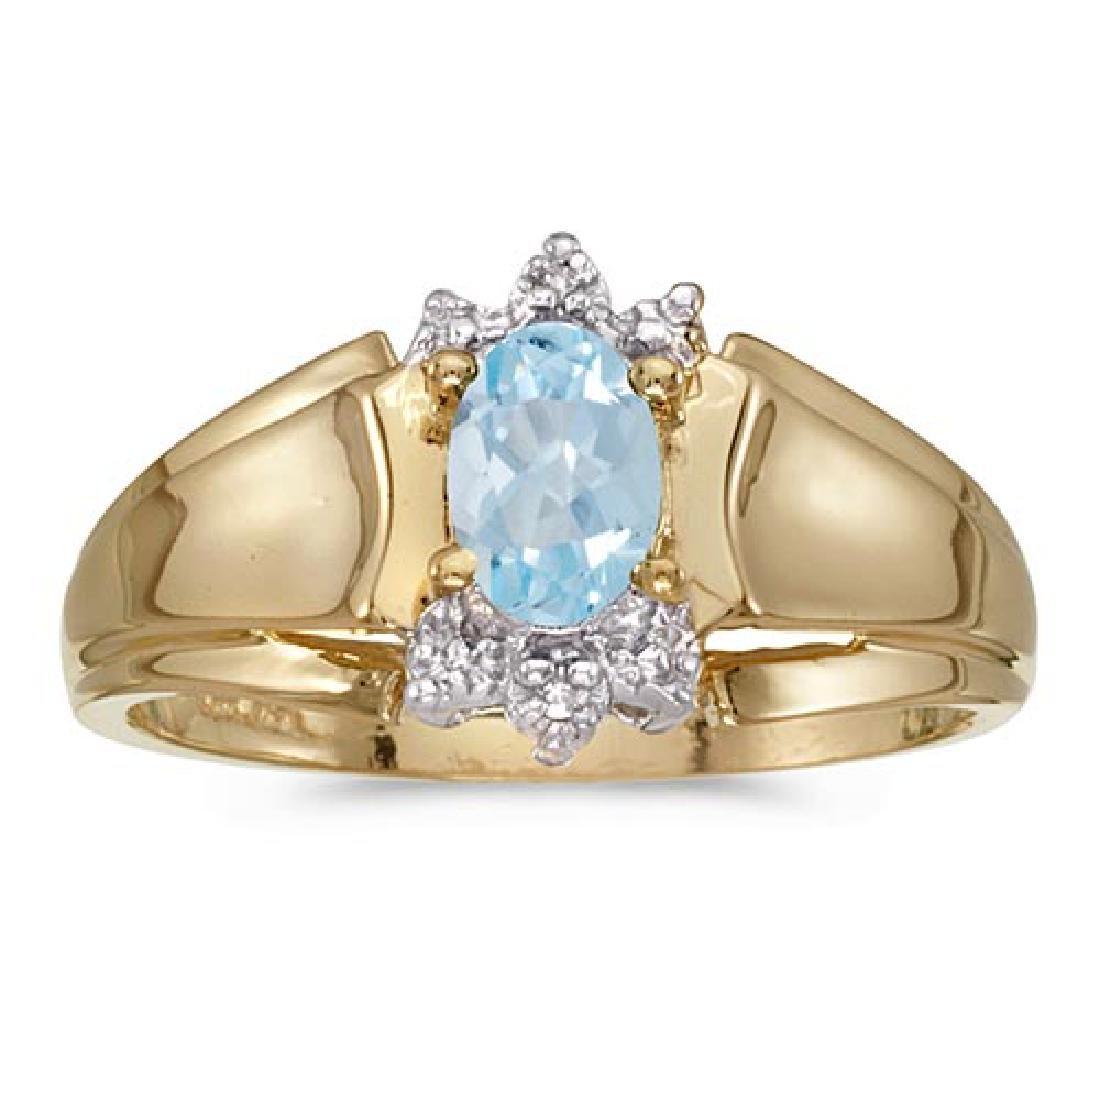 Certified 14k Yellow Gold Oval Aquamarine And Diamond R